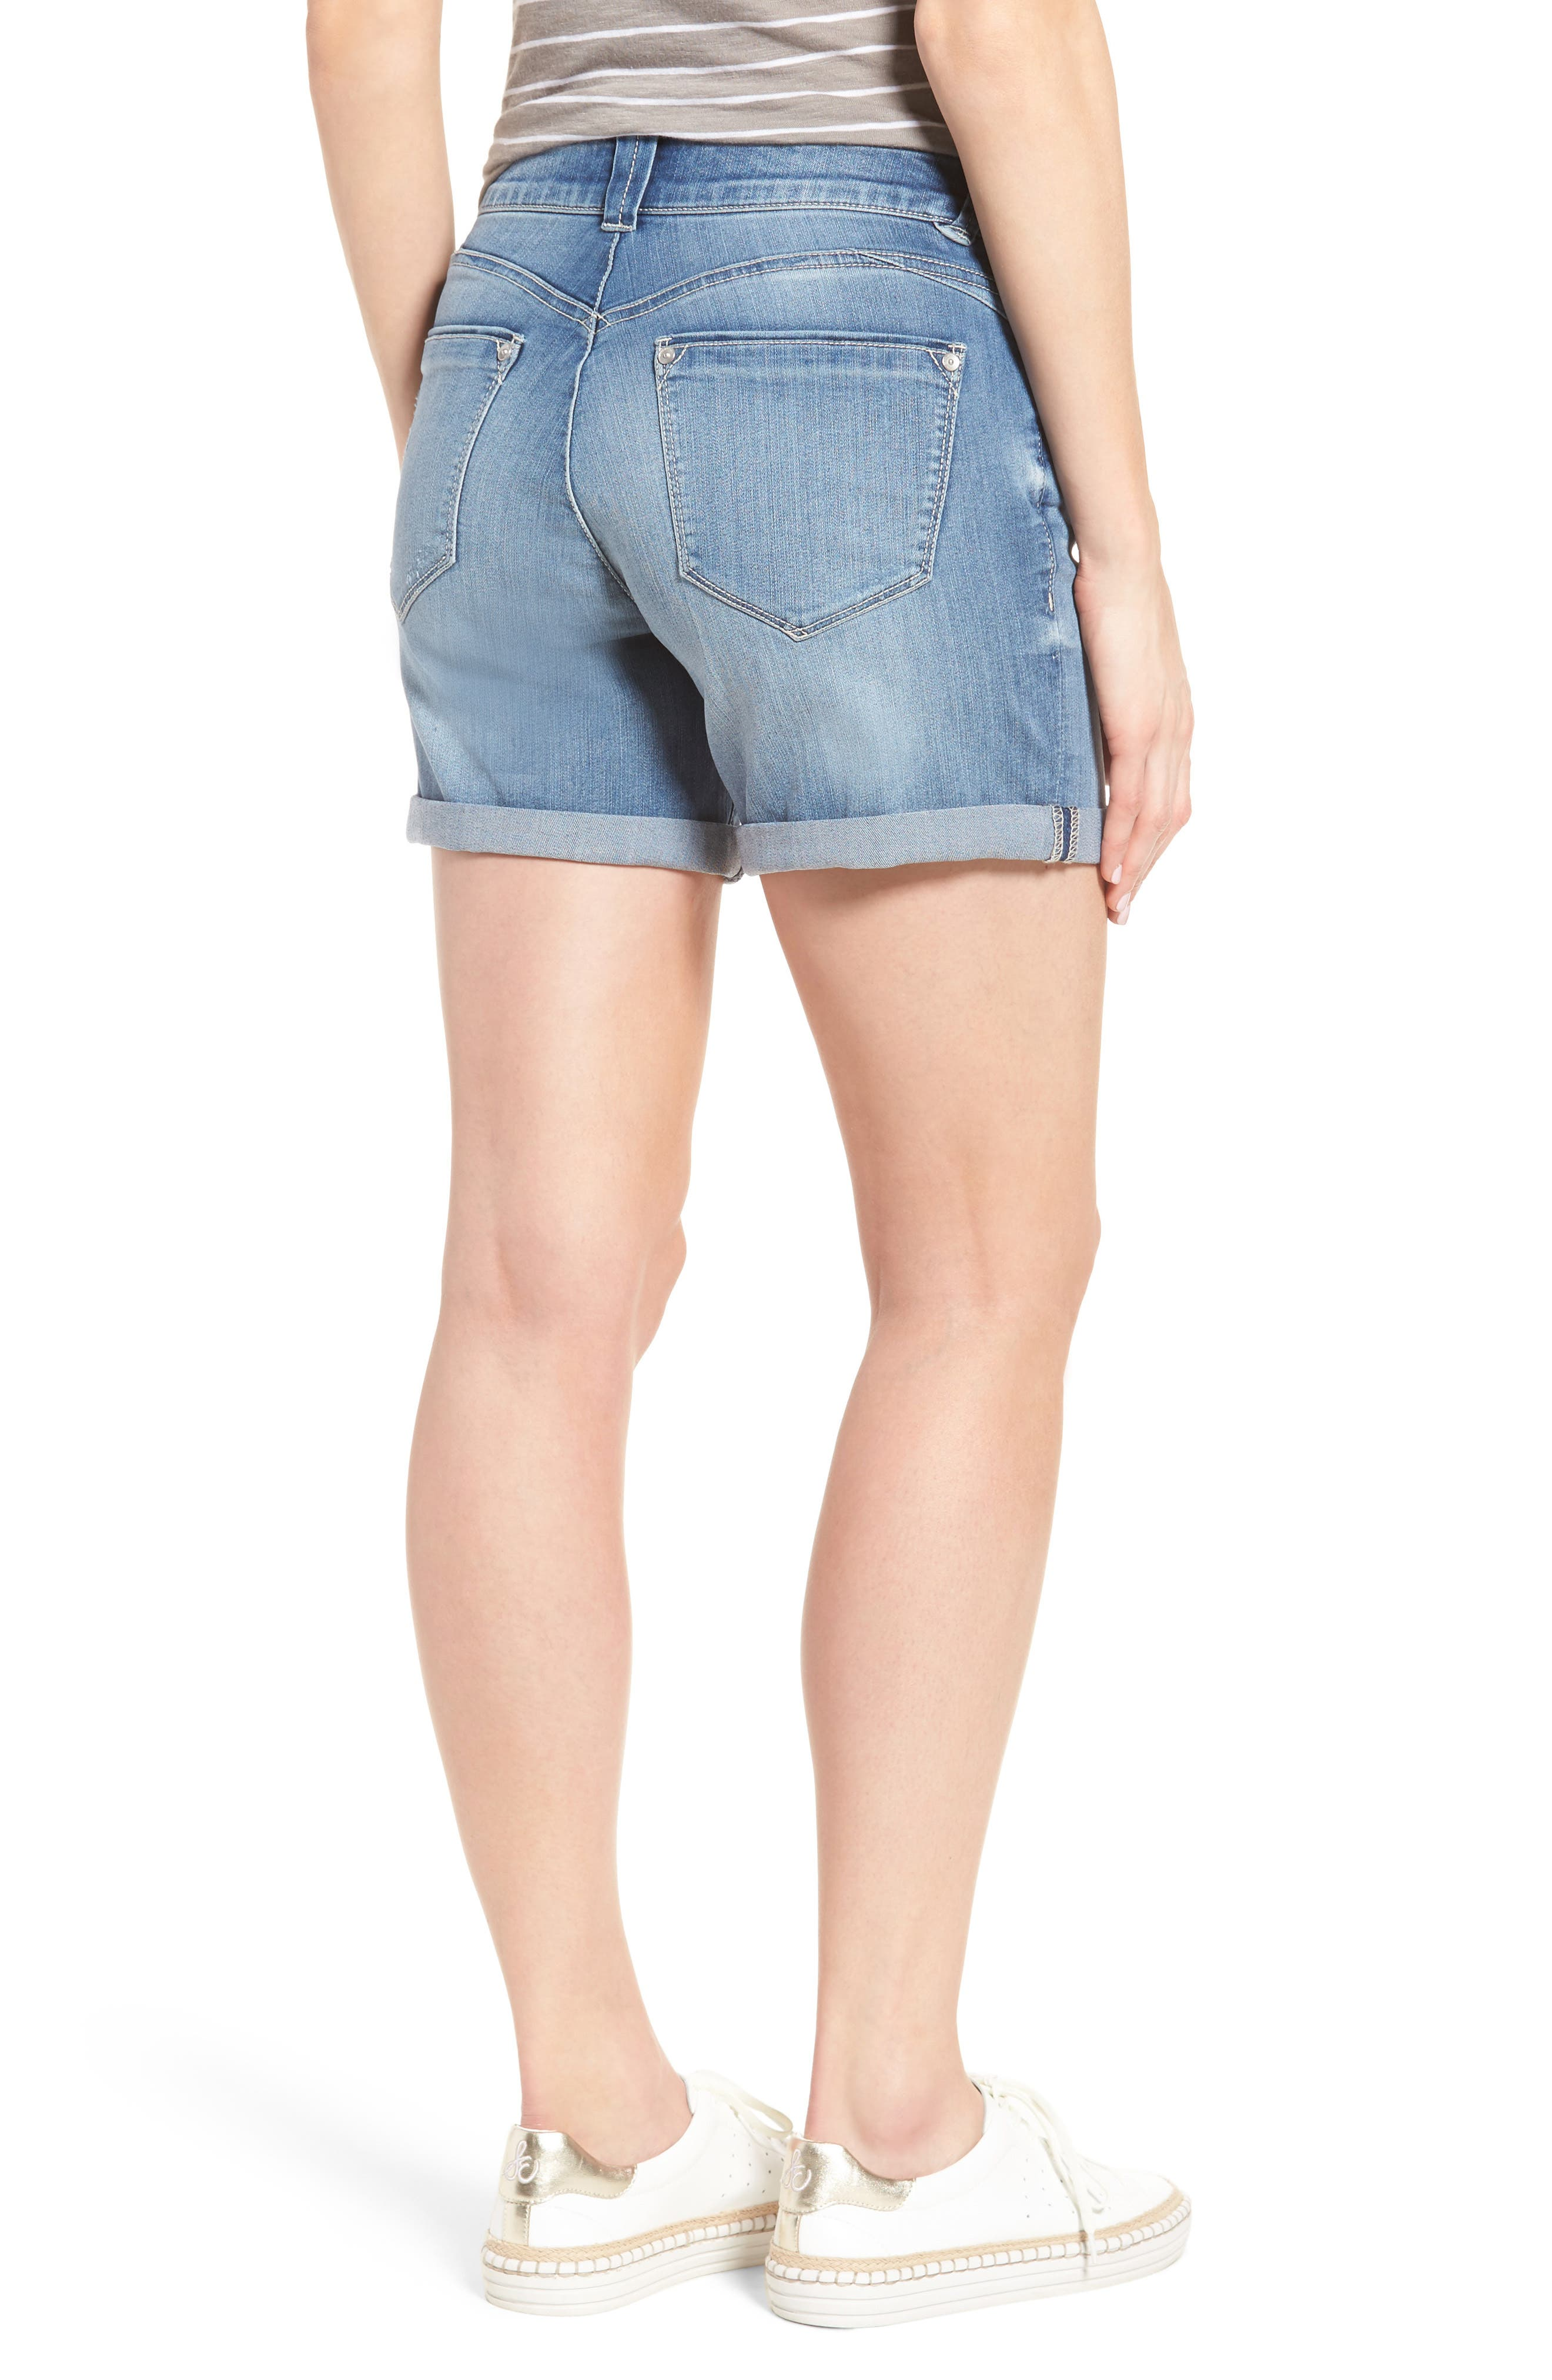 Ab-solution Cuffed Denim Shorts,                             Alternate thumbnail 2, color,                             458